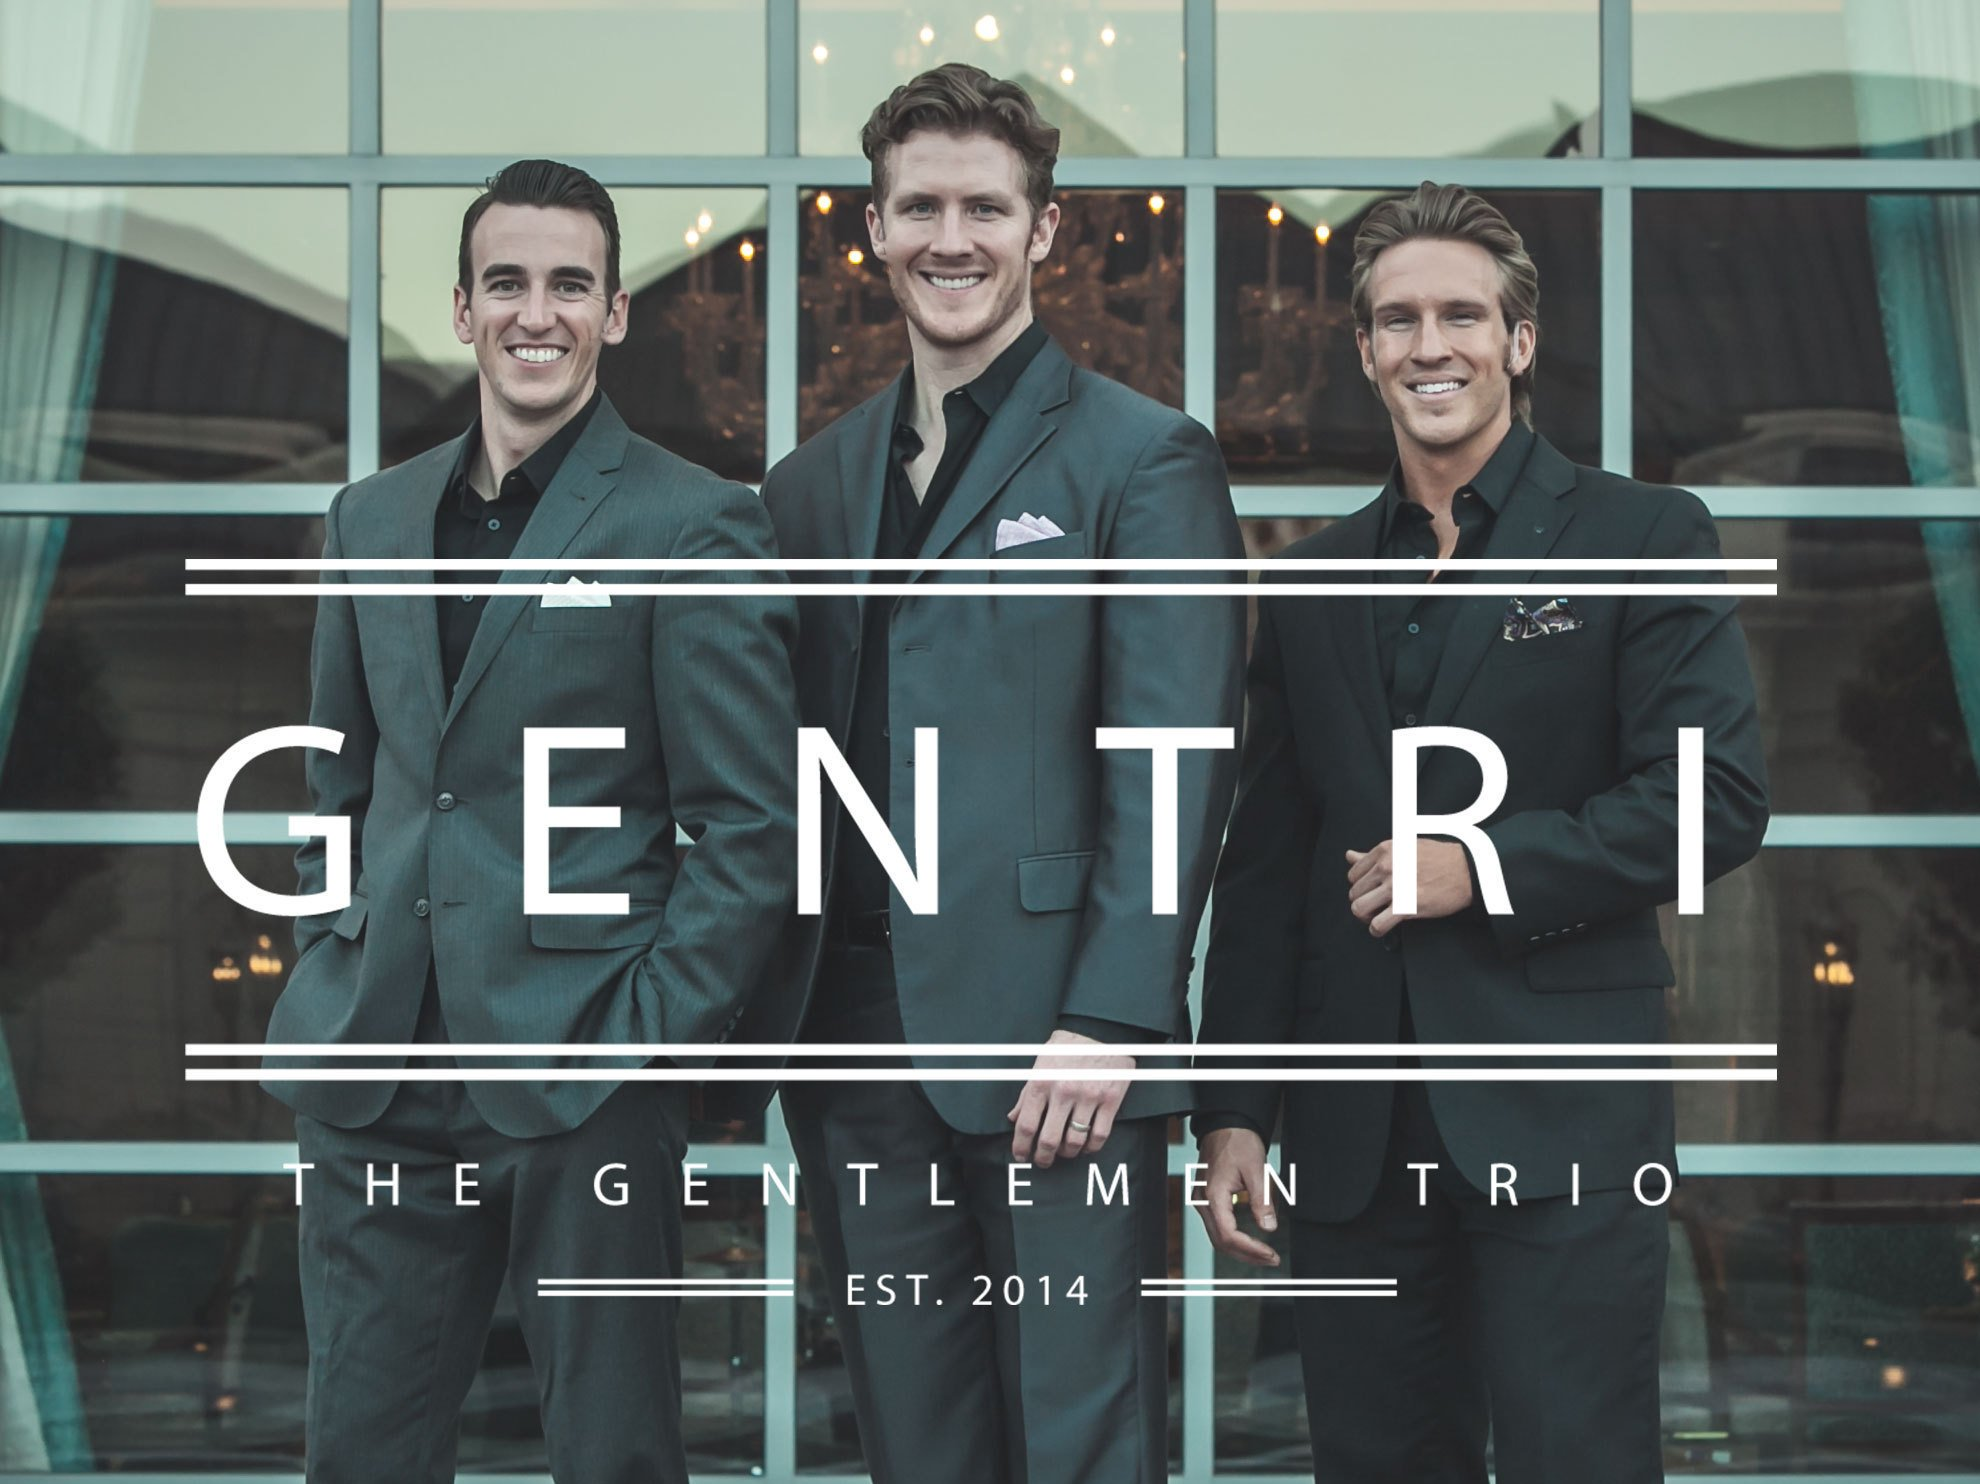 Image for GENTRI